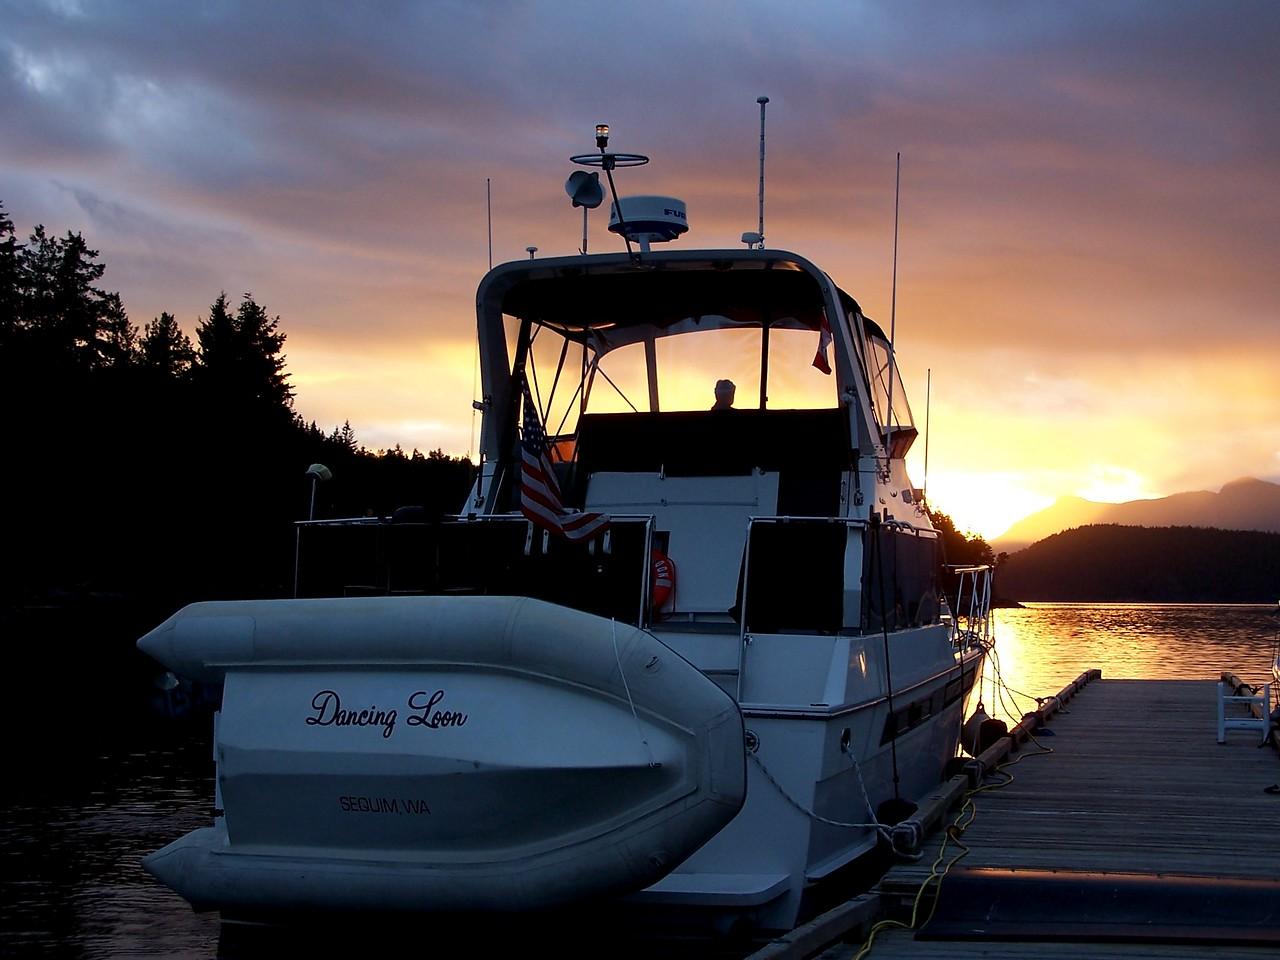 Sunset at Egmont, B.C.